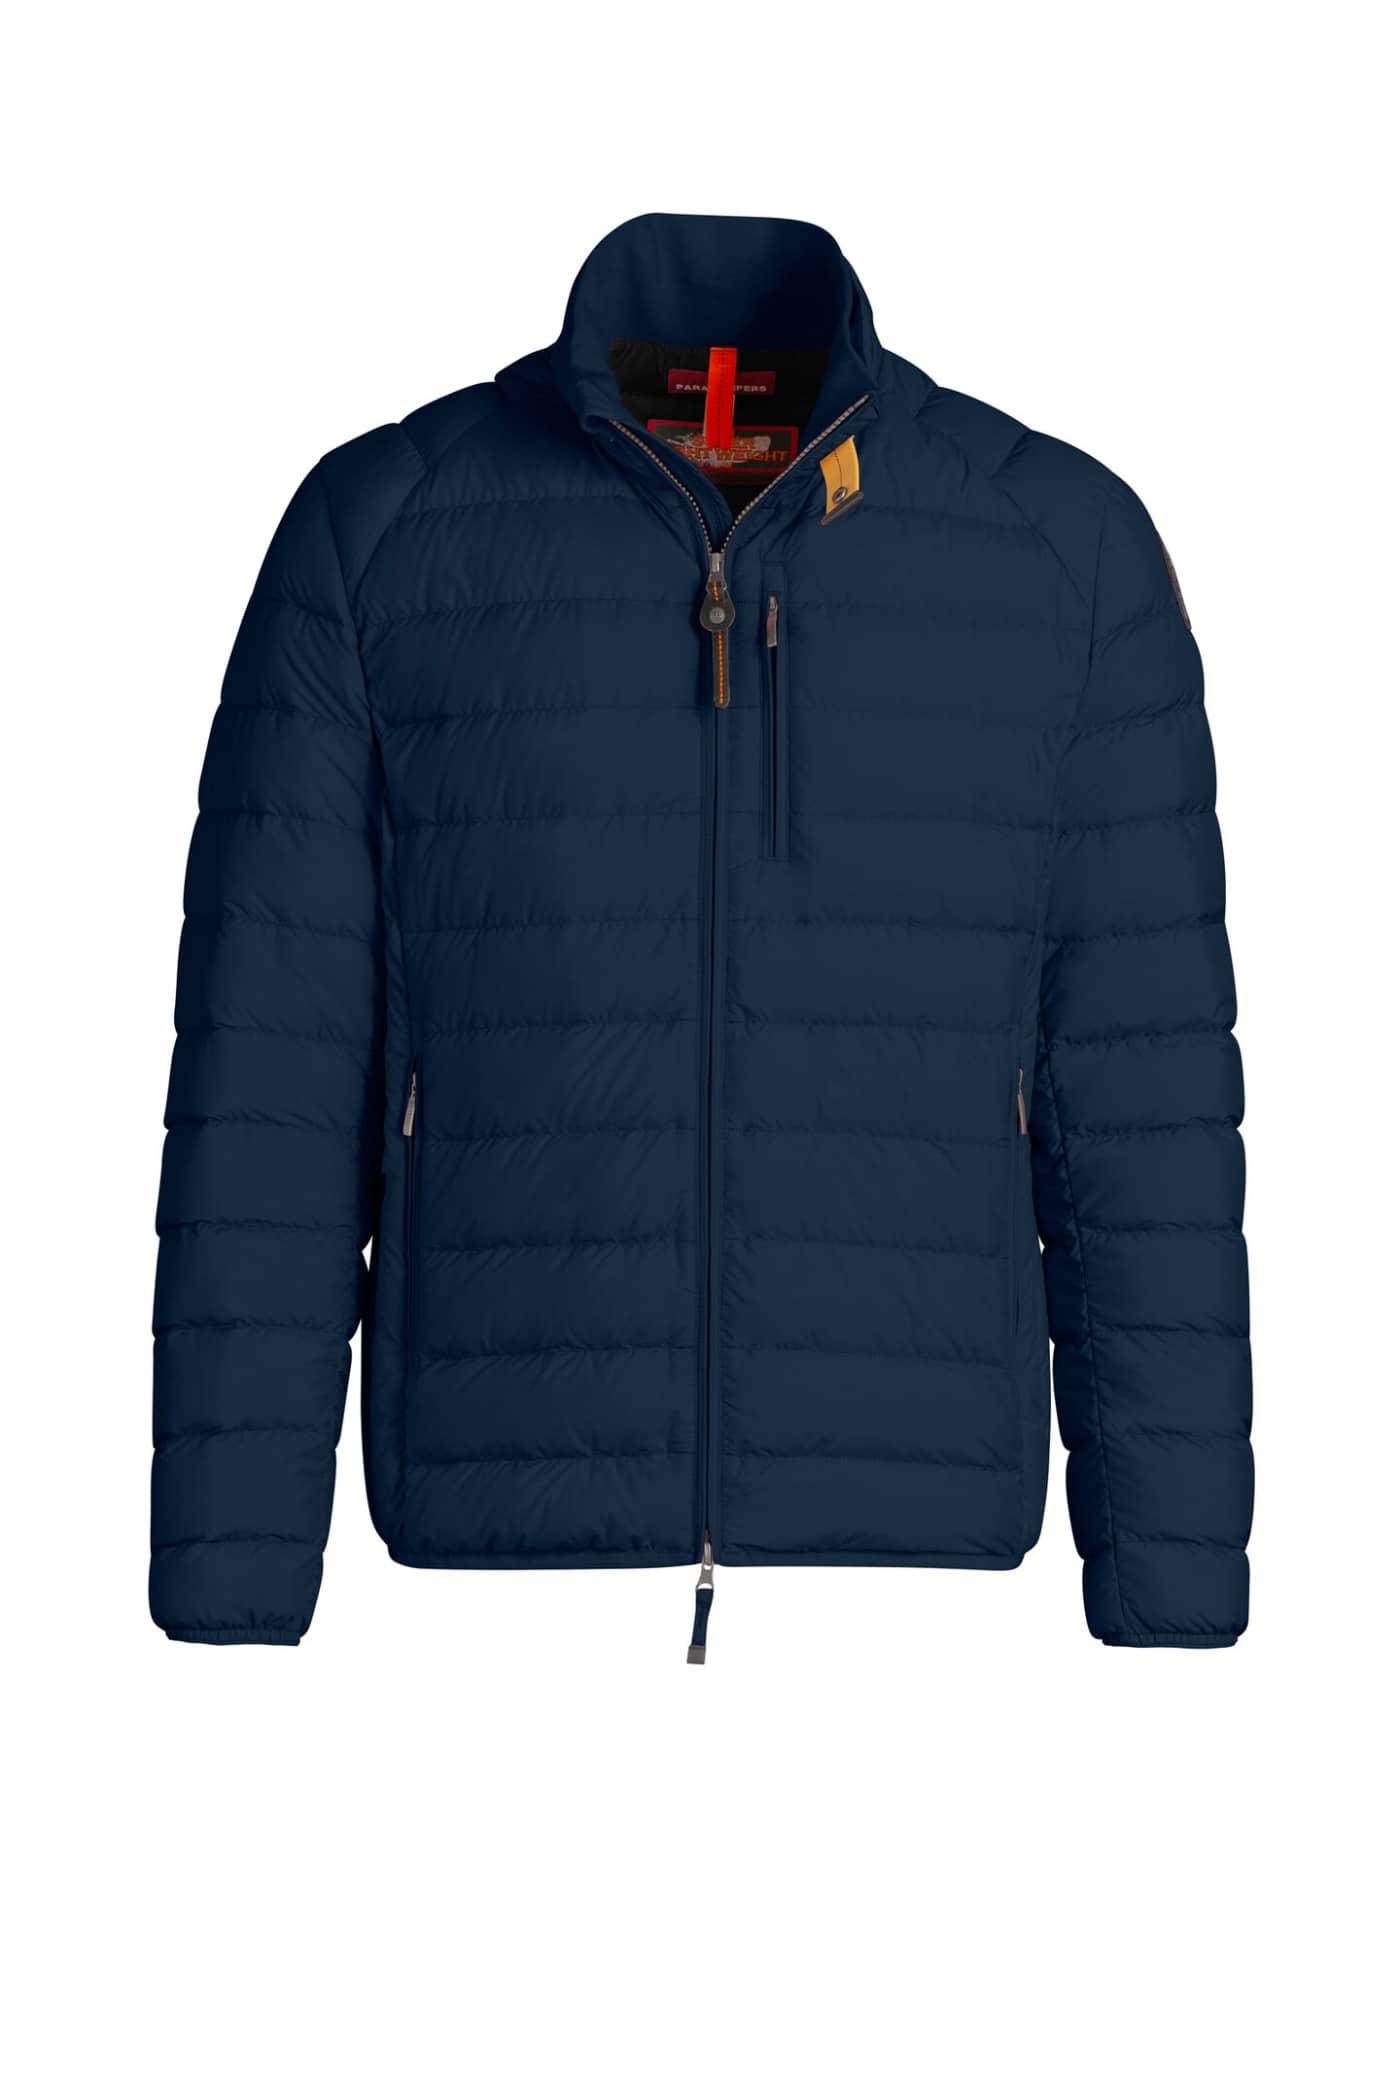 Hood, Sleeve, Blue, Black, Outerwear, Jacket, Clothing